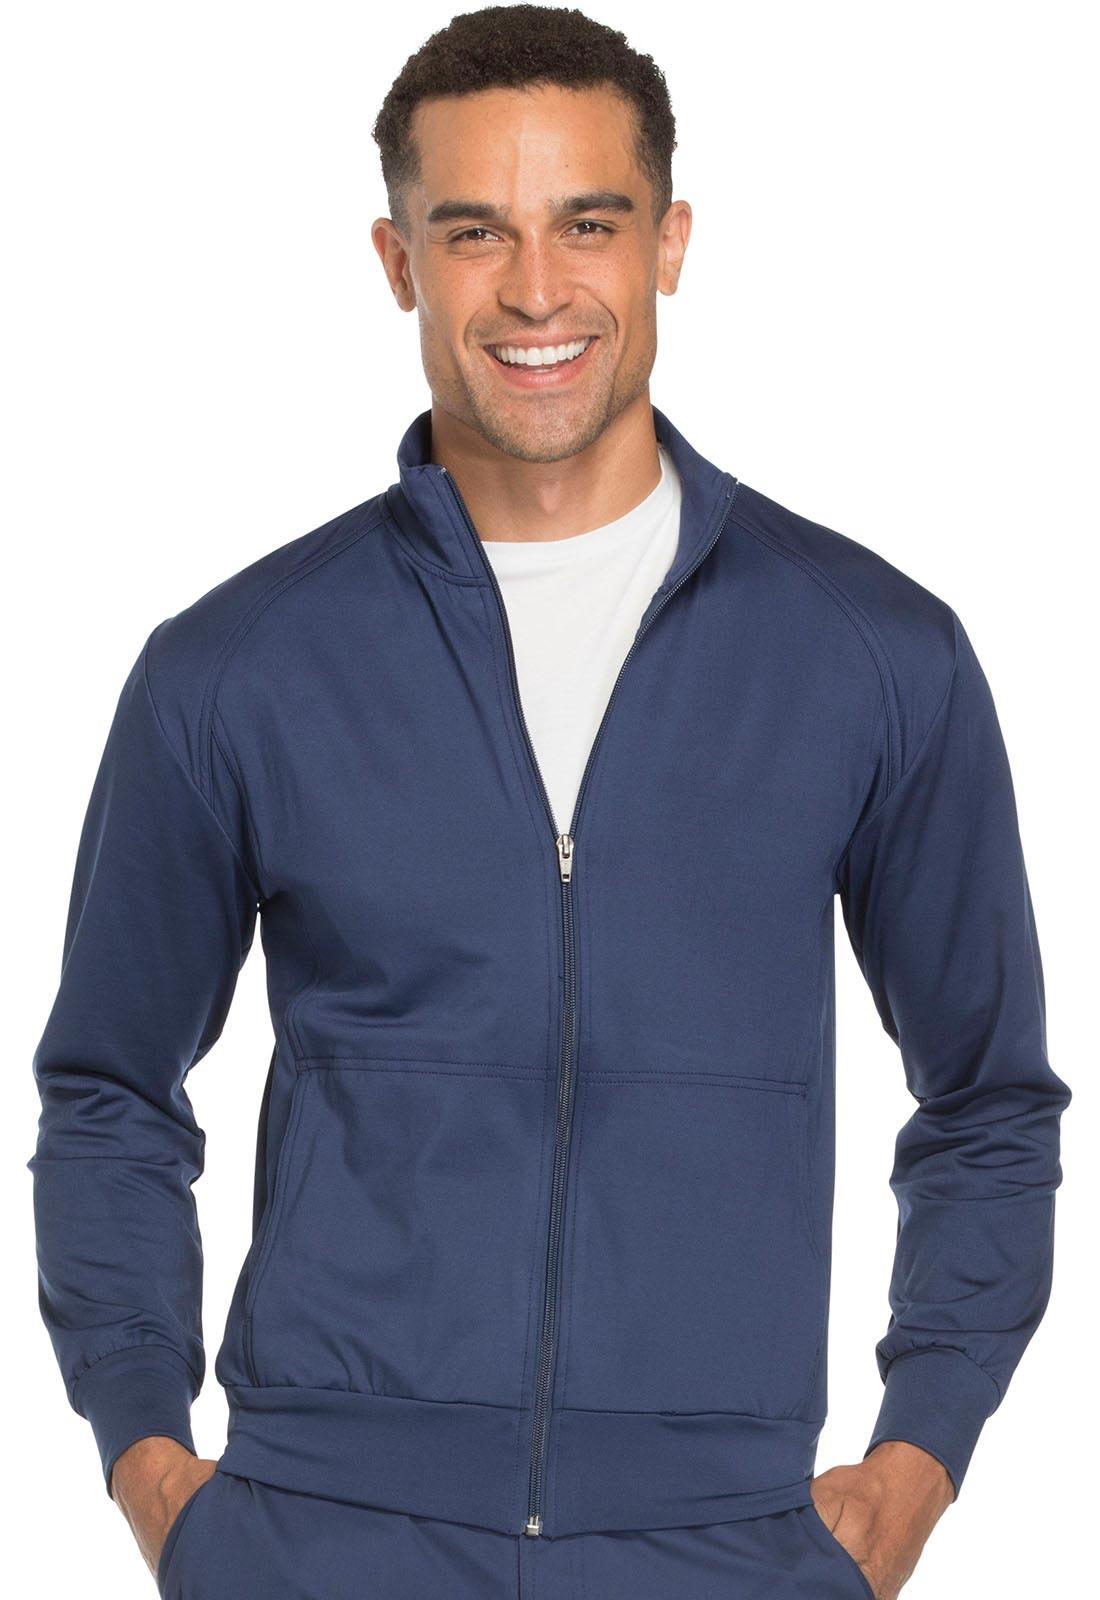 Unisex Zip Front Warm-Up Jacket